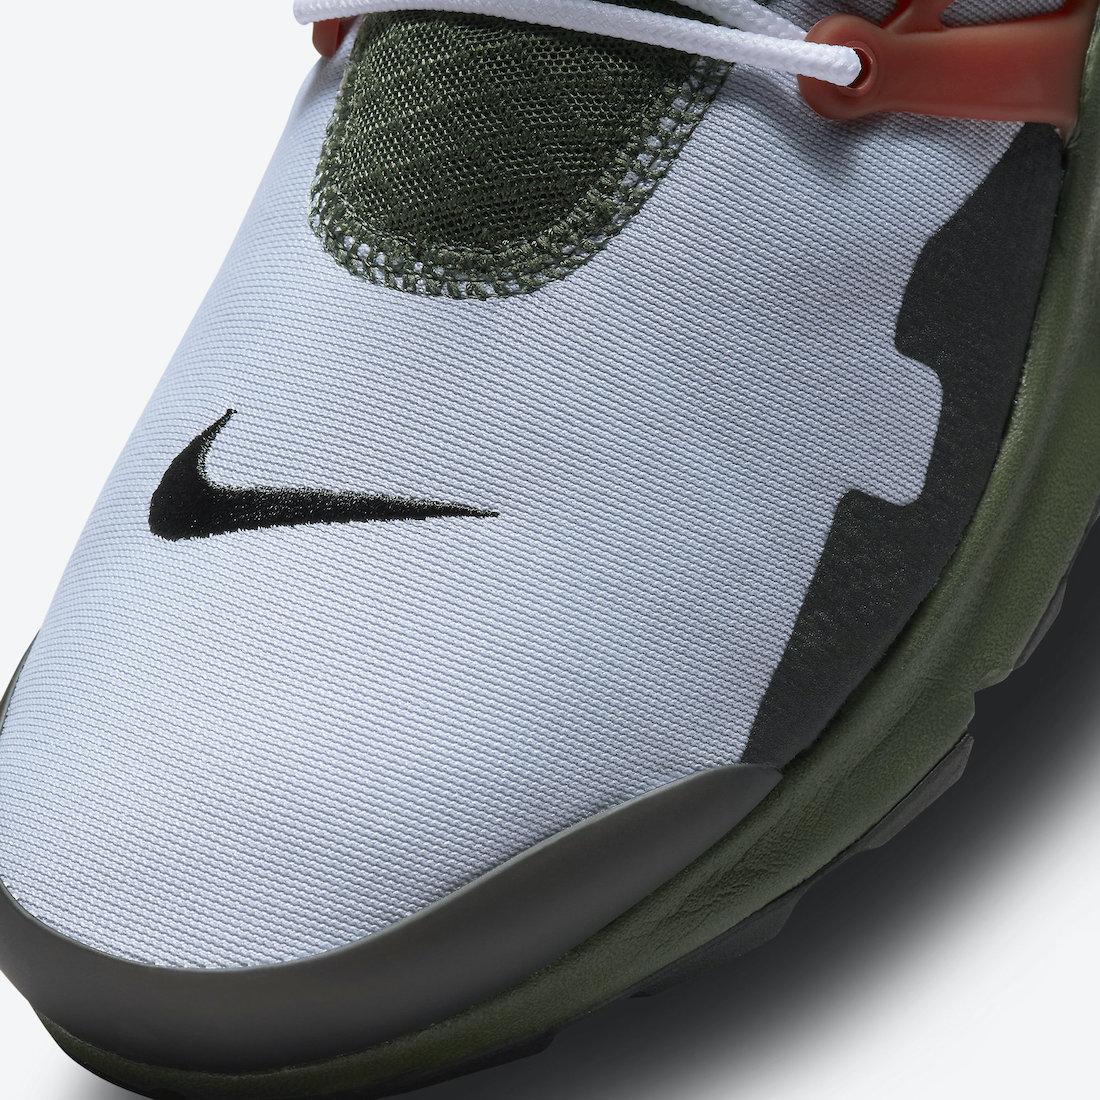 Nike,Air,Presto,Mid,Utility,作为  星战配色!全新三款 Nike Air Presto 官图曝光!